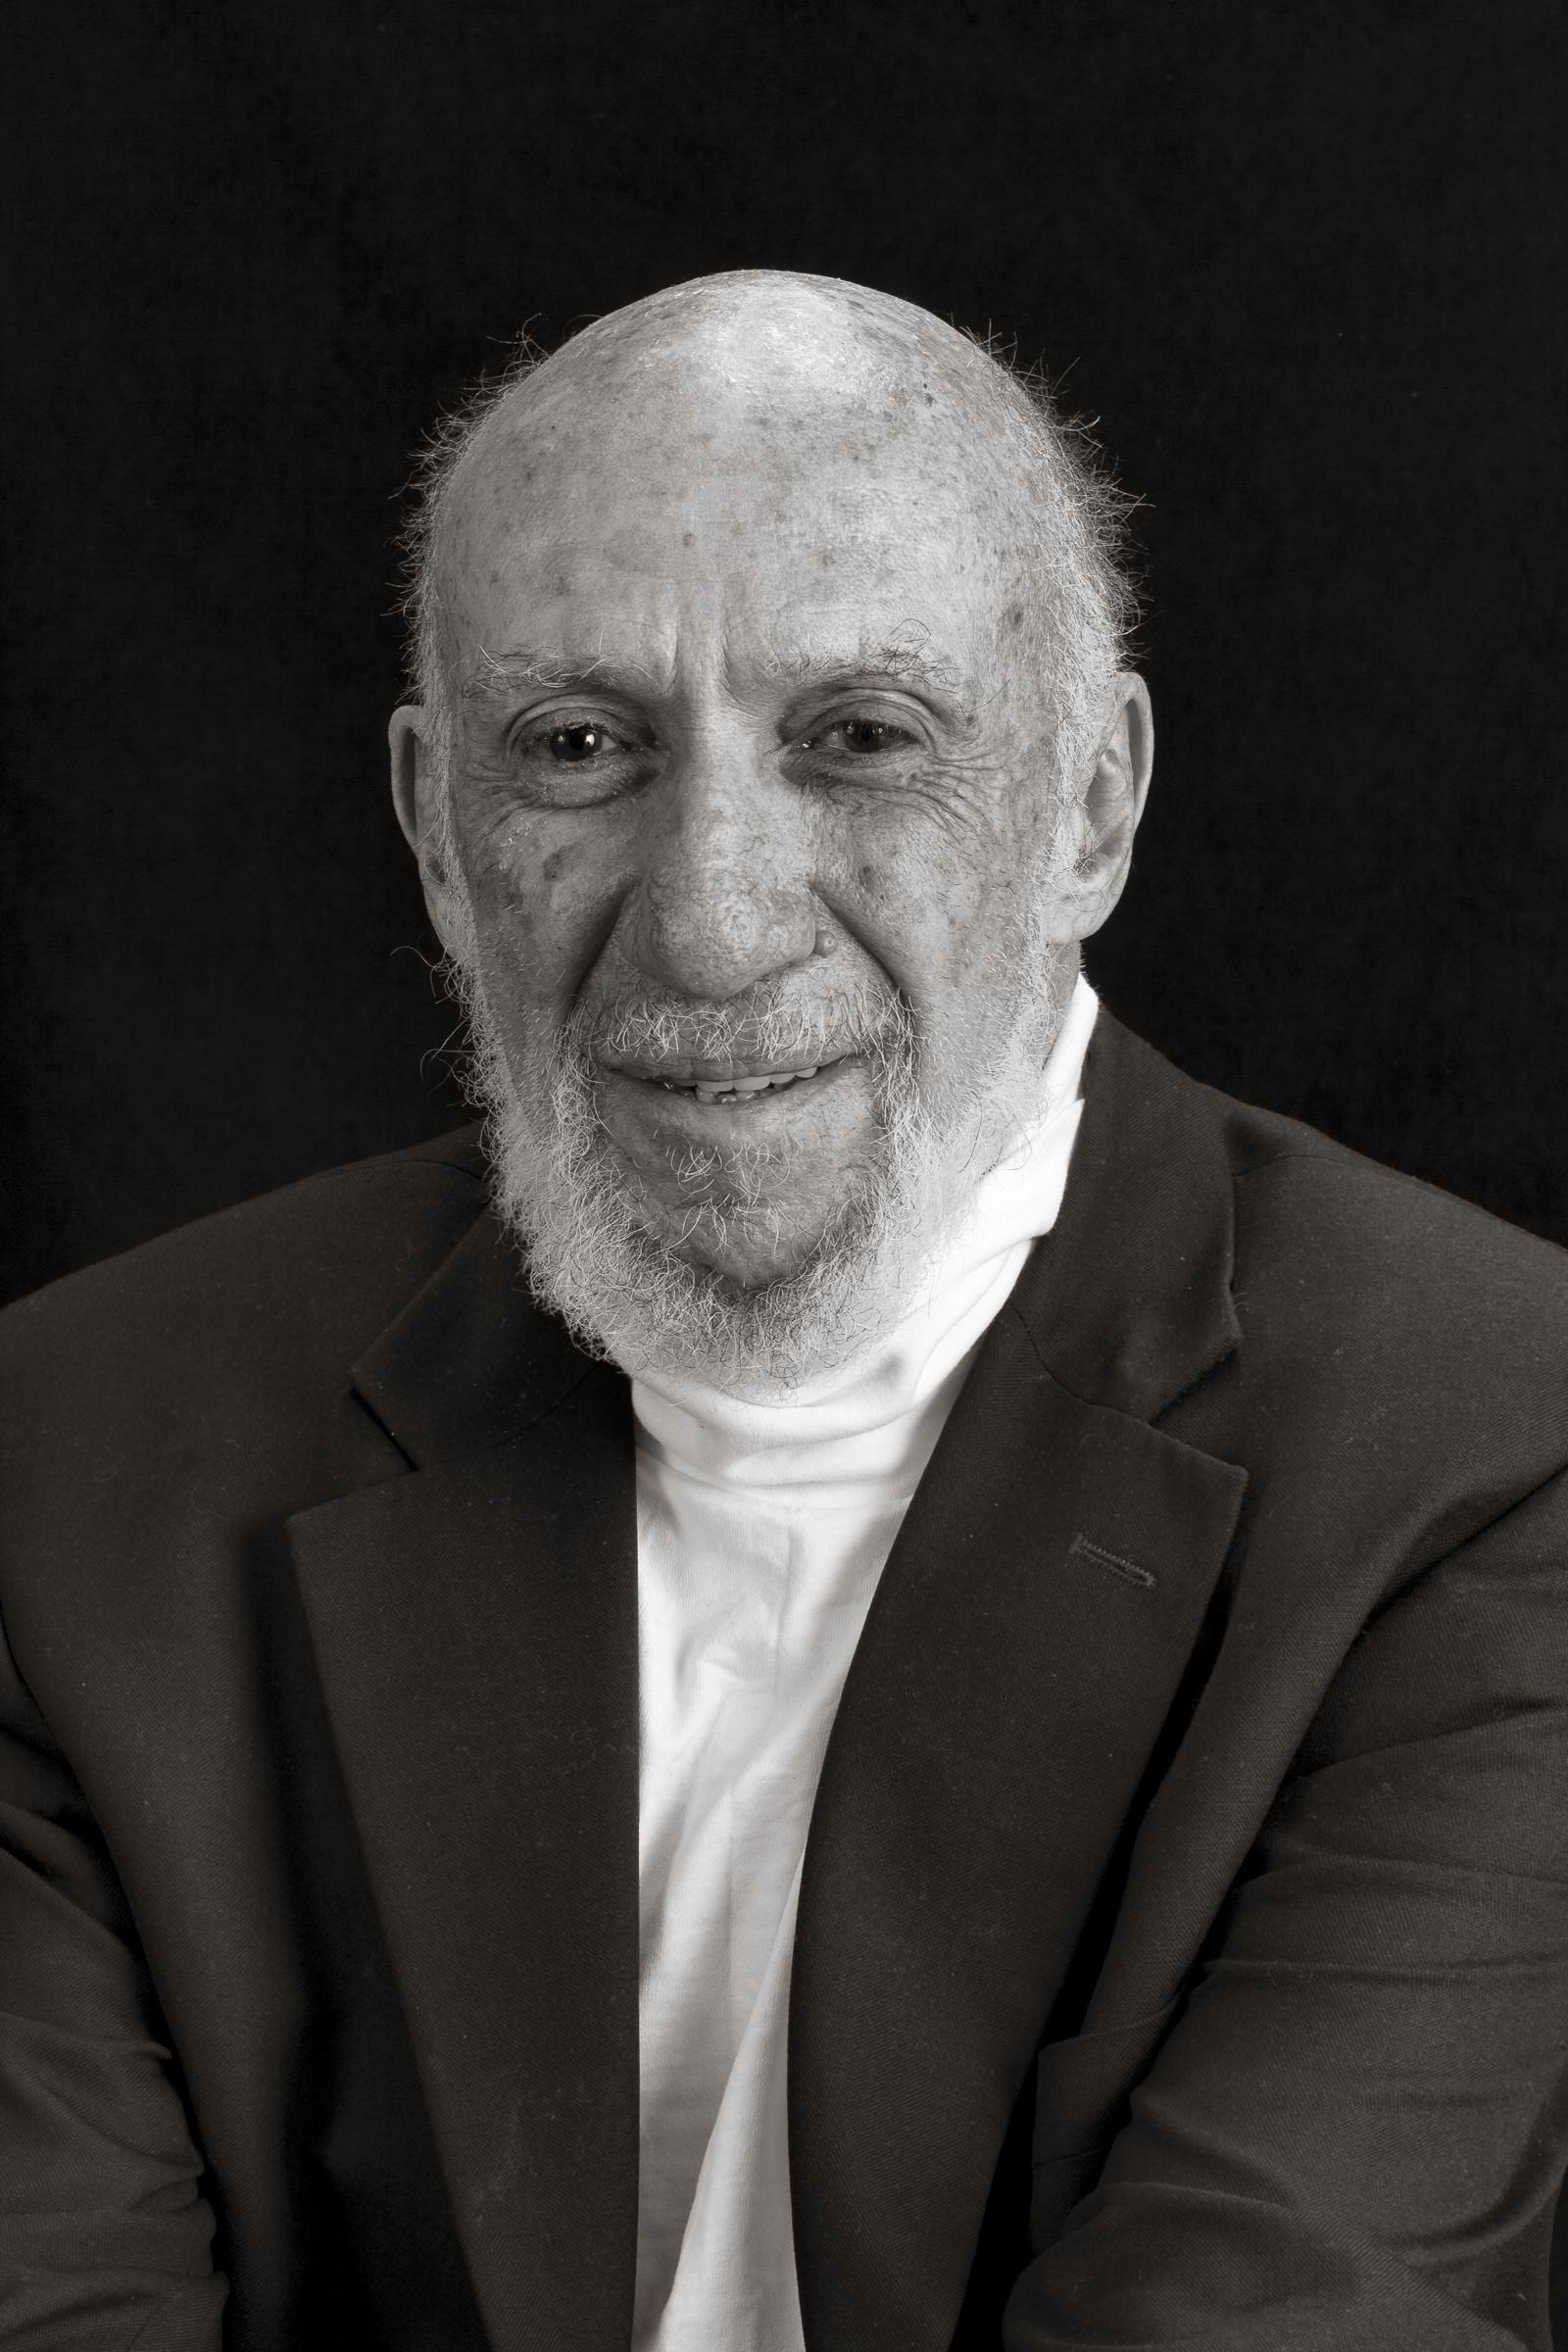 Professor Richard Falk